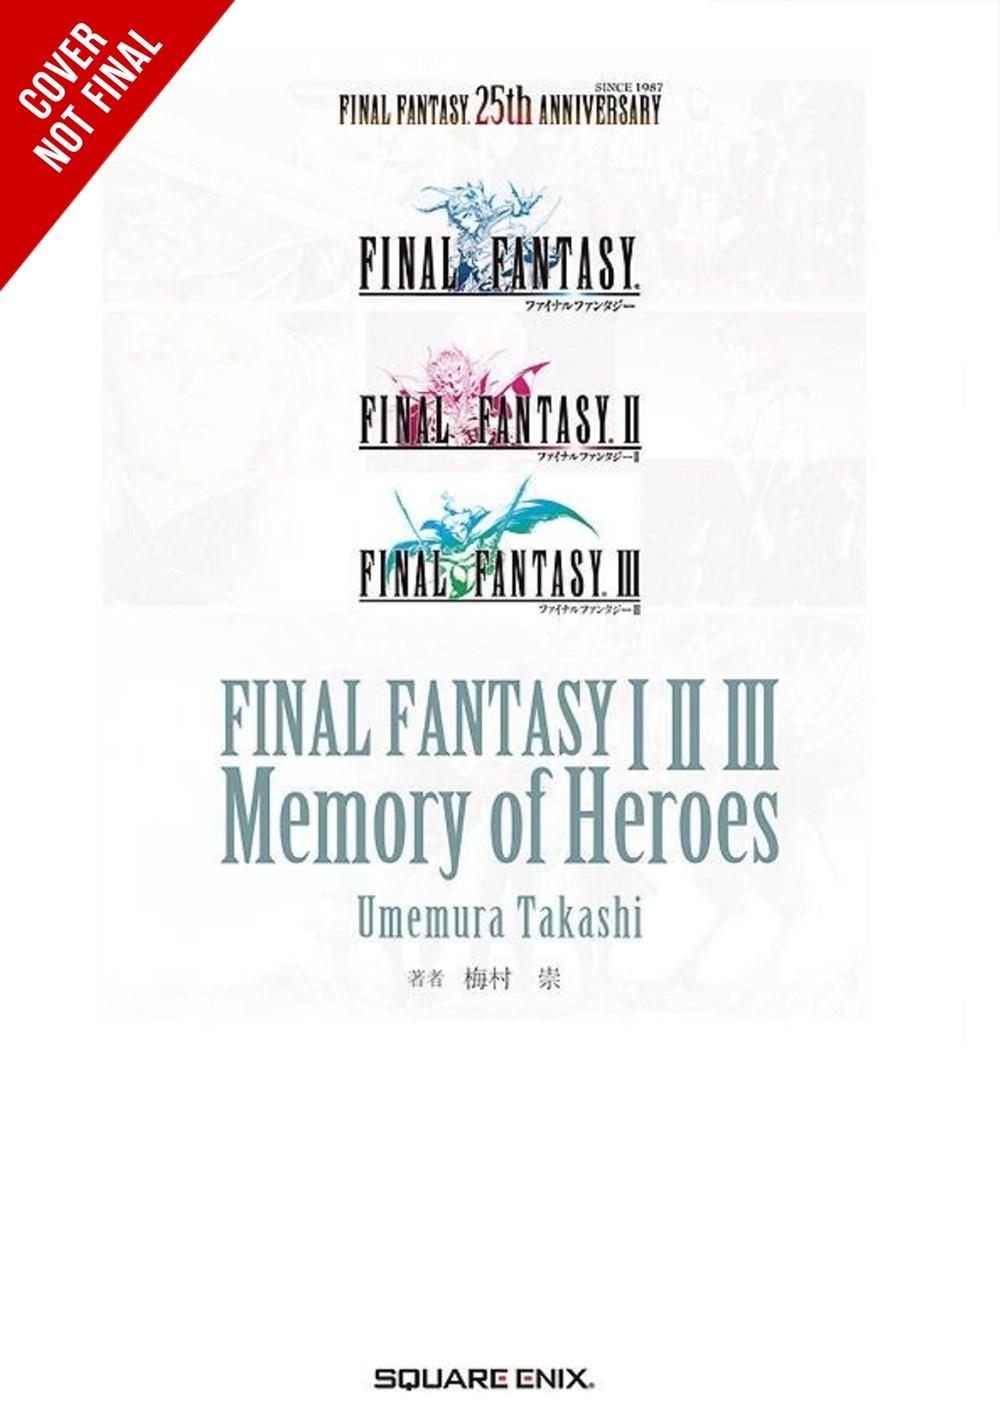 Final Fantasy I*II*III Novel